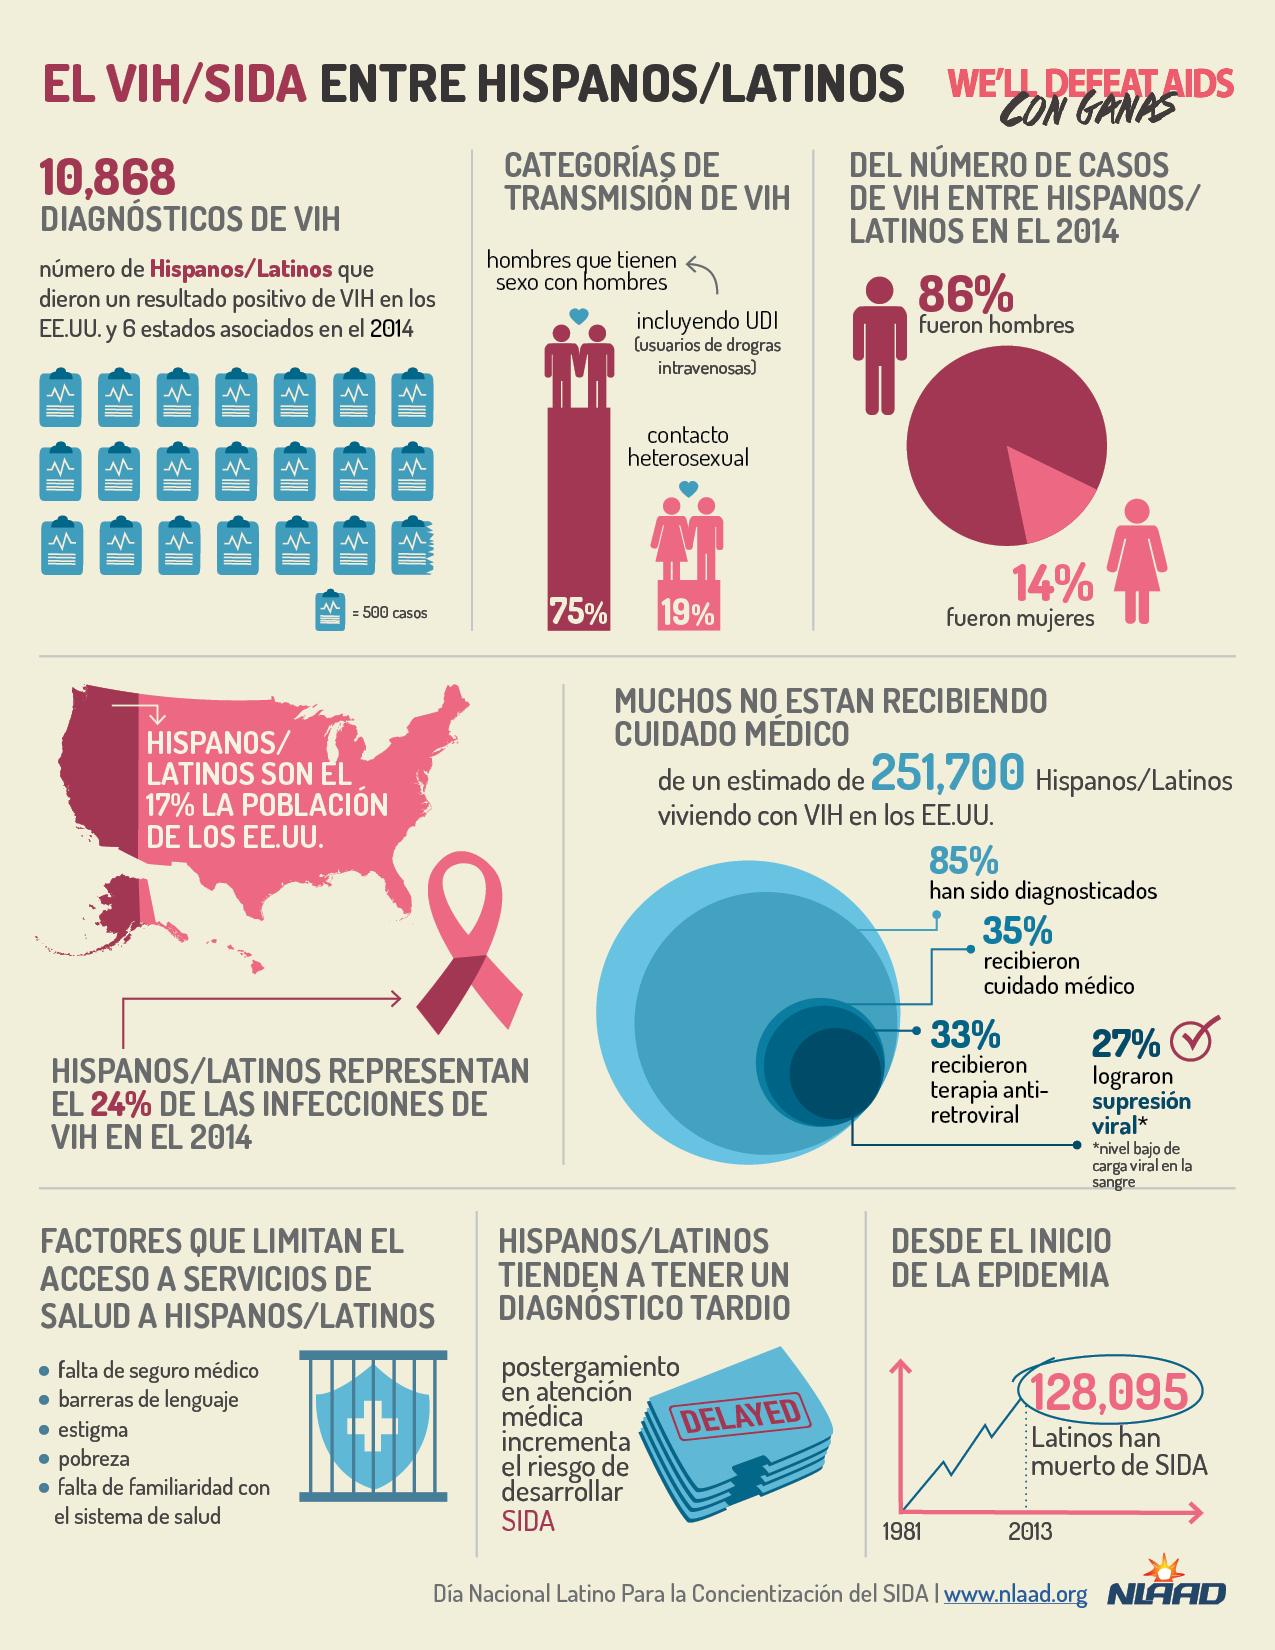 HIV/AIDS Among Latinos/Hispanos in the EE.UU.